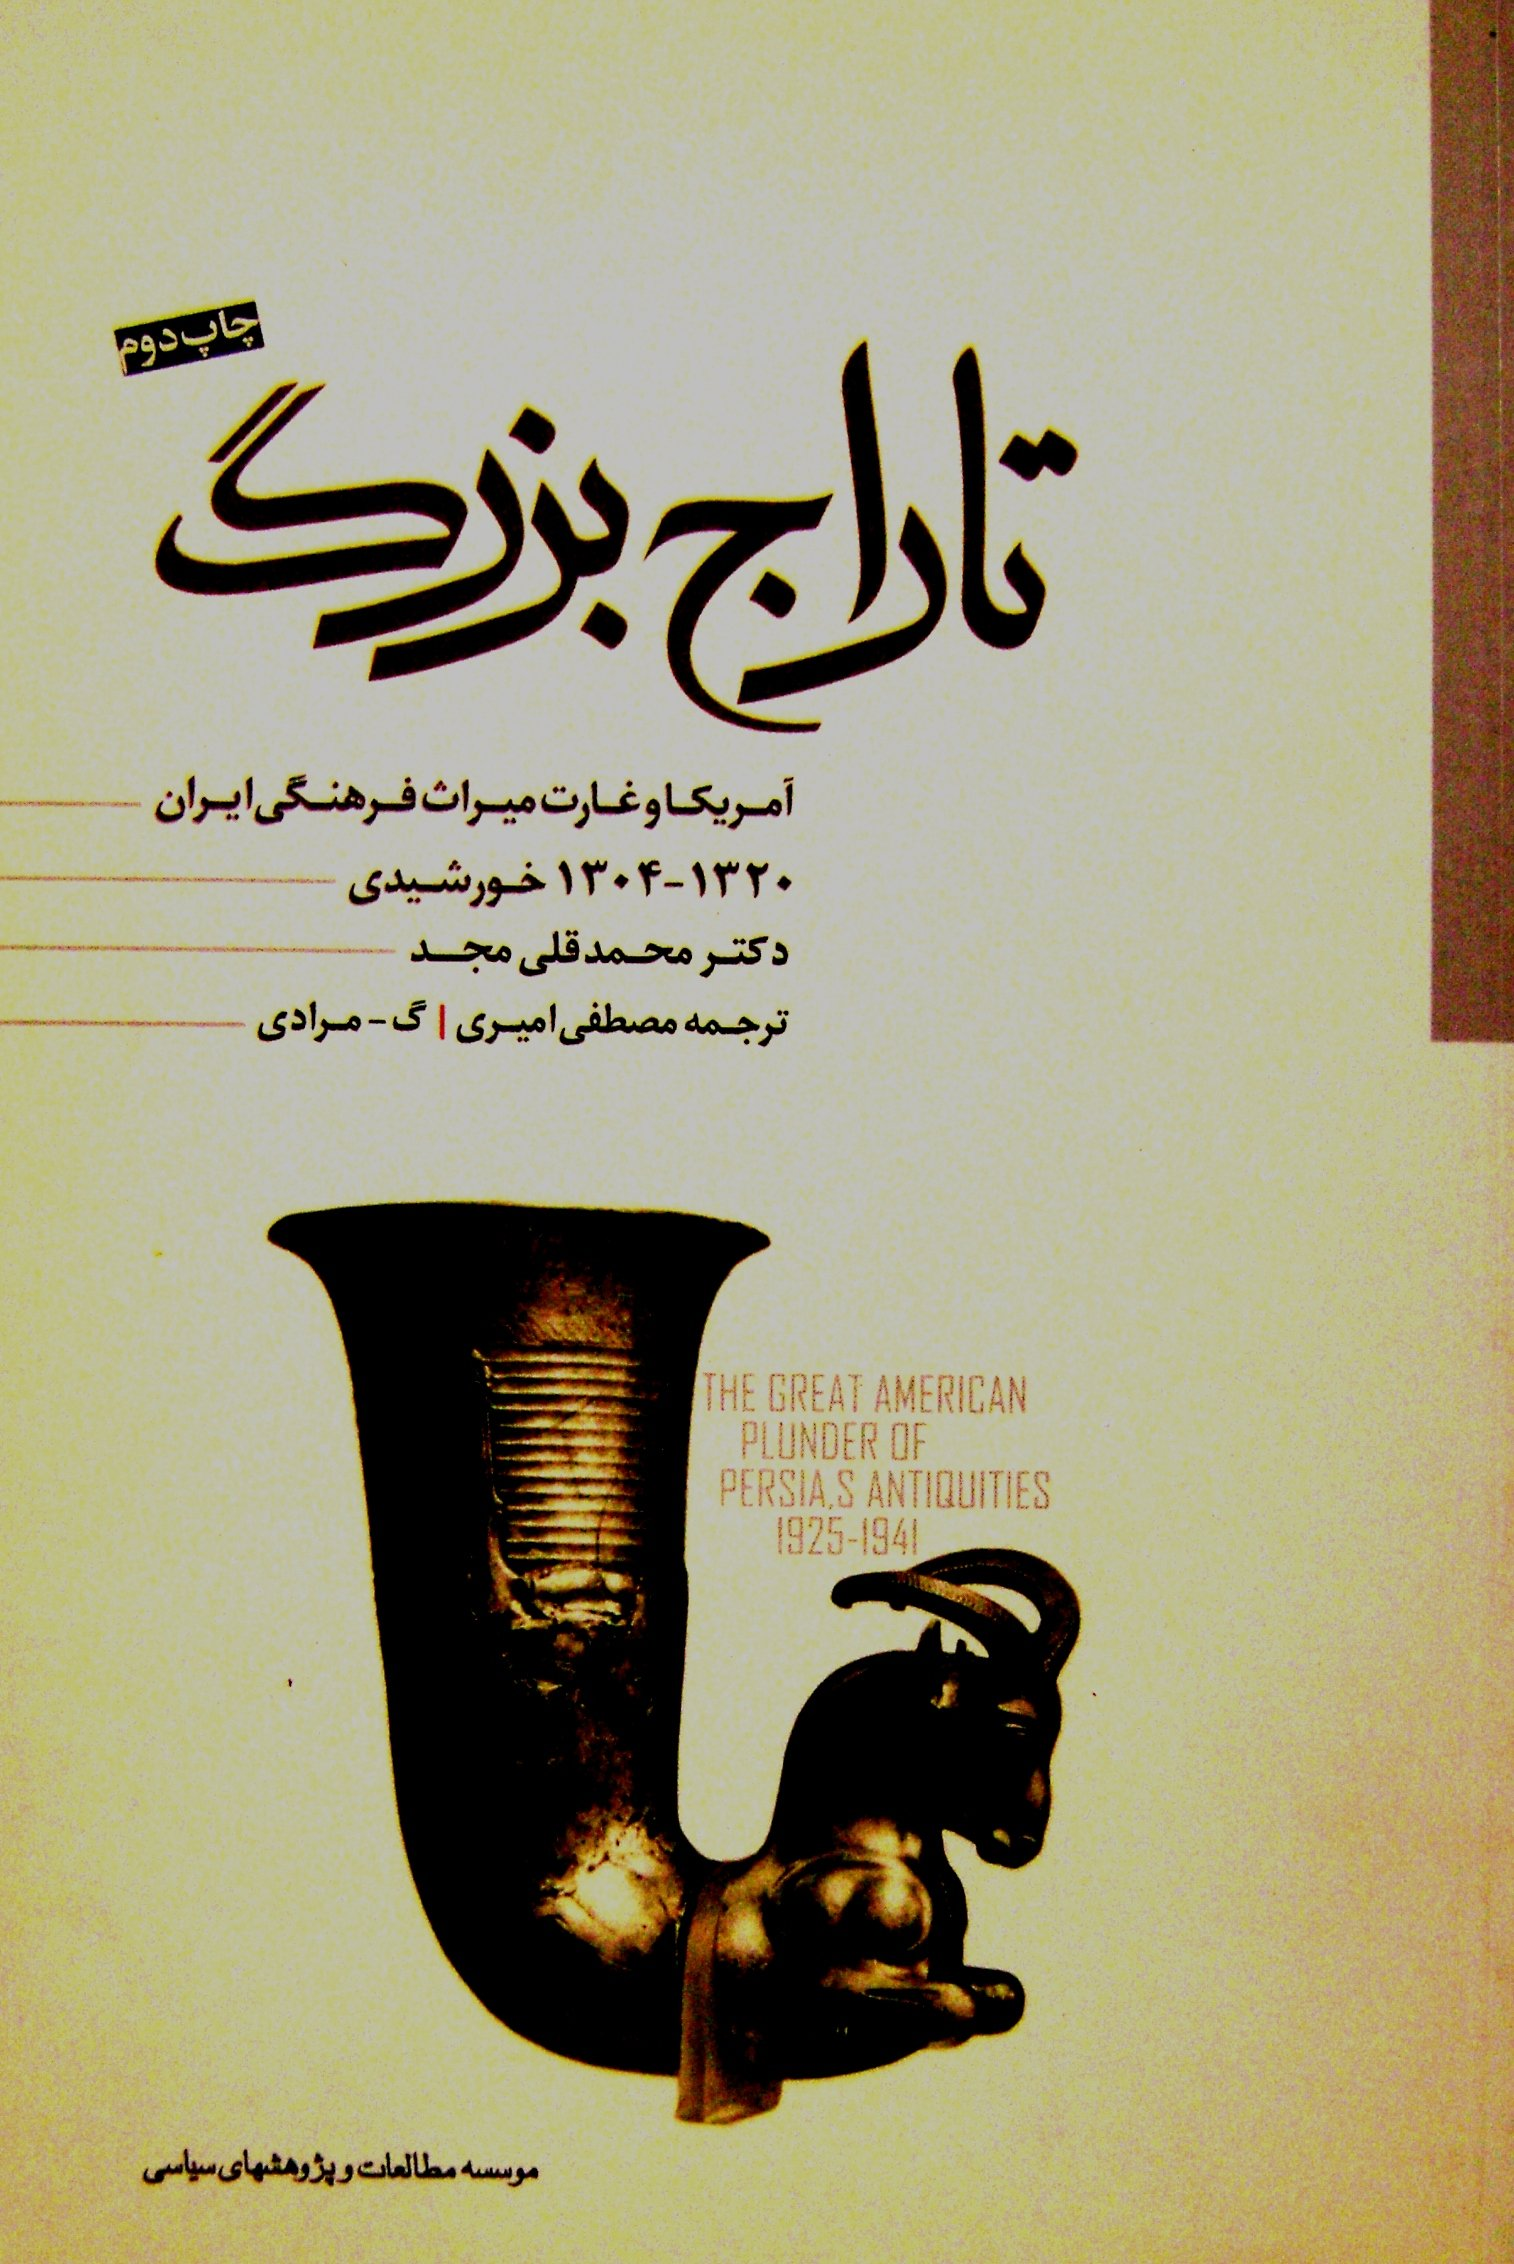 "Read Online Taraje Bozorg; Amrica va Gharate Mirathe Farhangiye Iran 1304-1320. ""The Great American Plunder of Persia's Antiquities 1925-1941"" pdf"